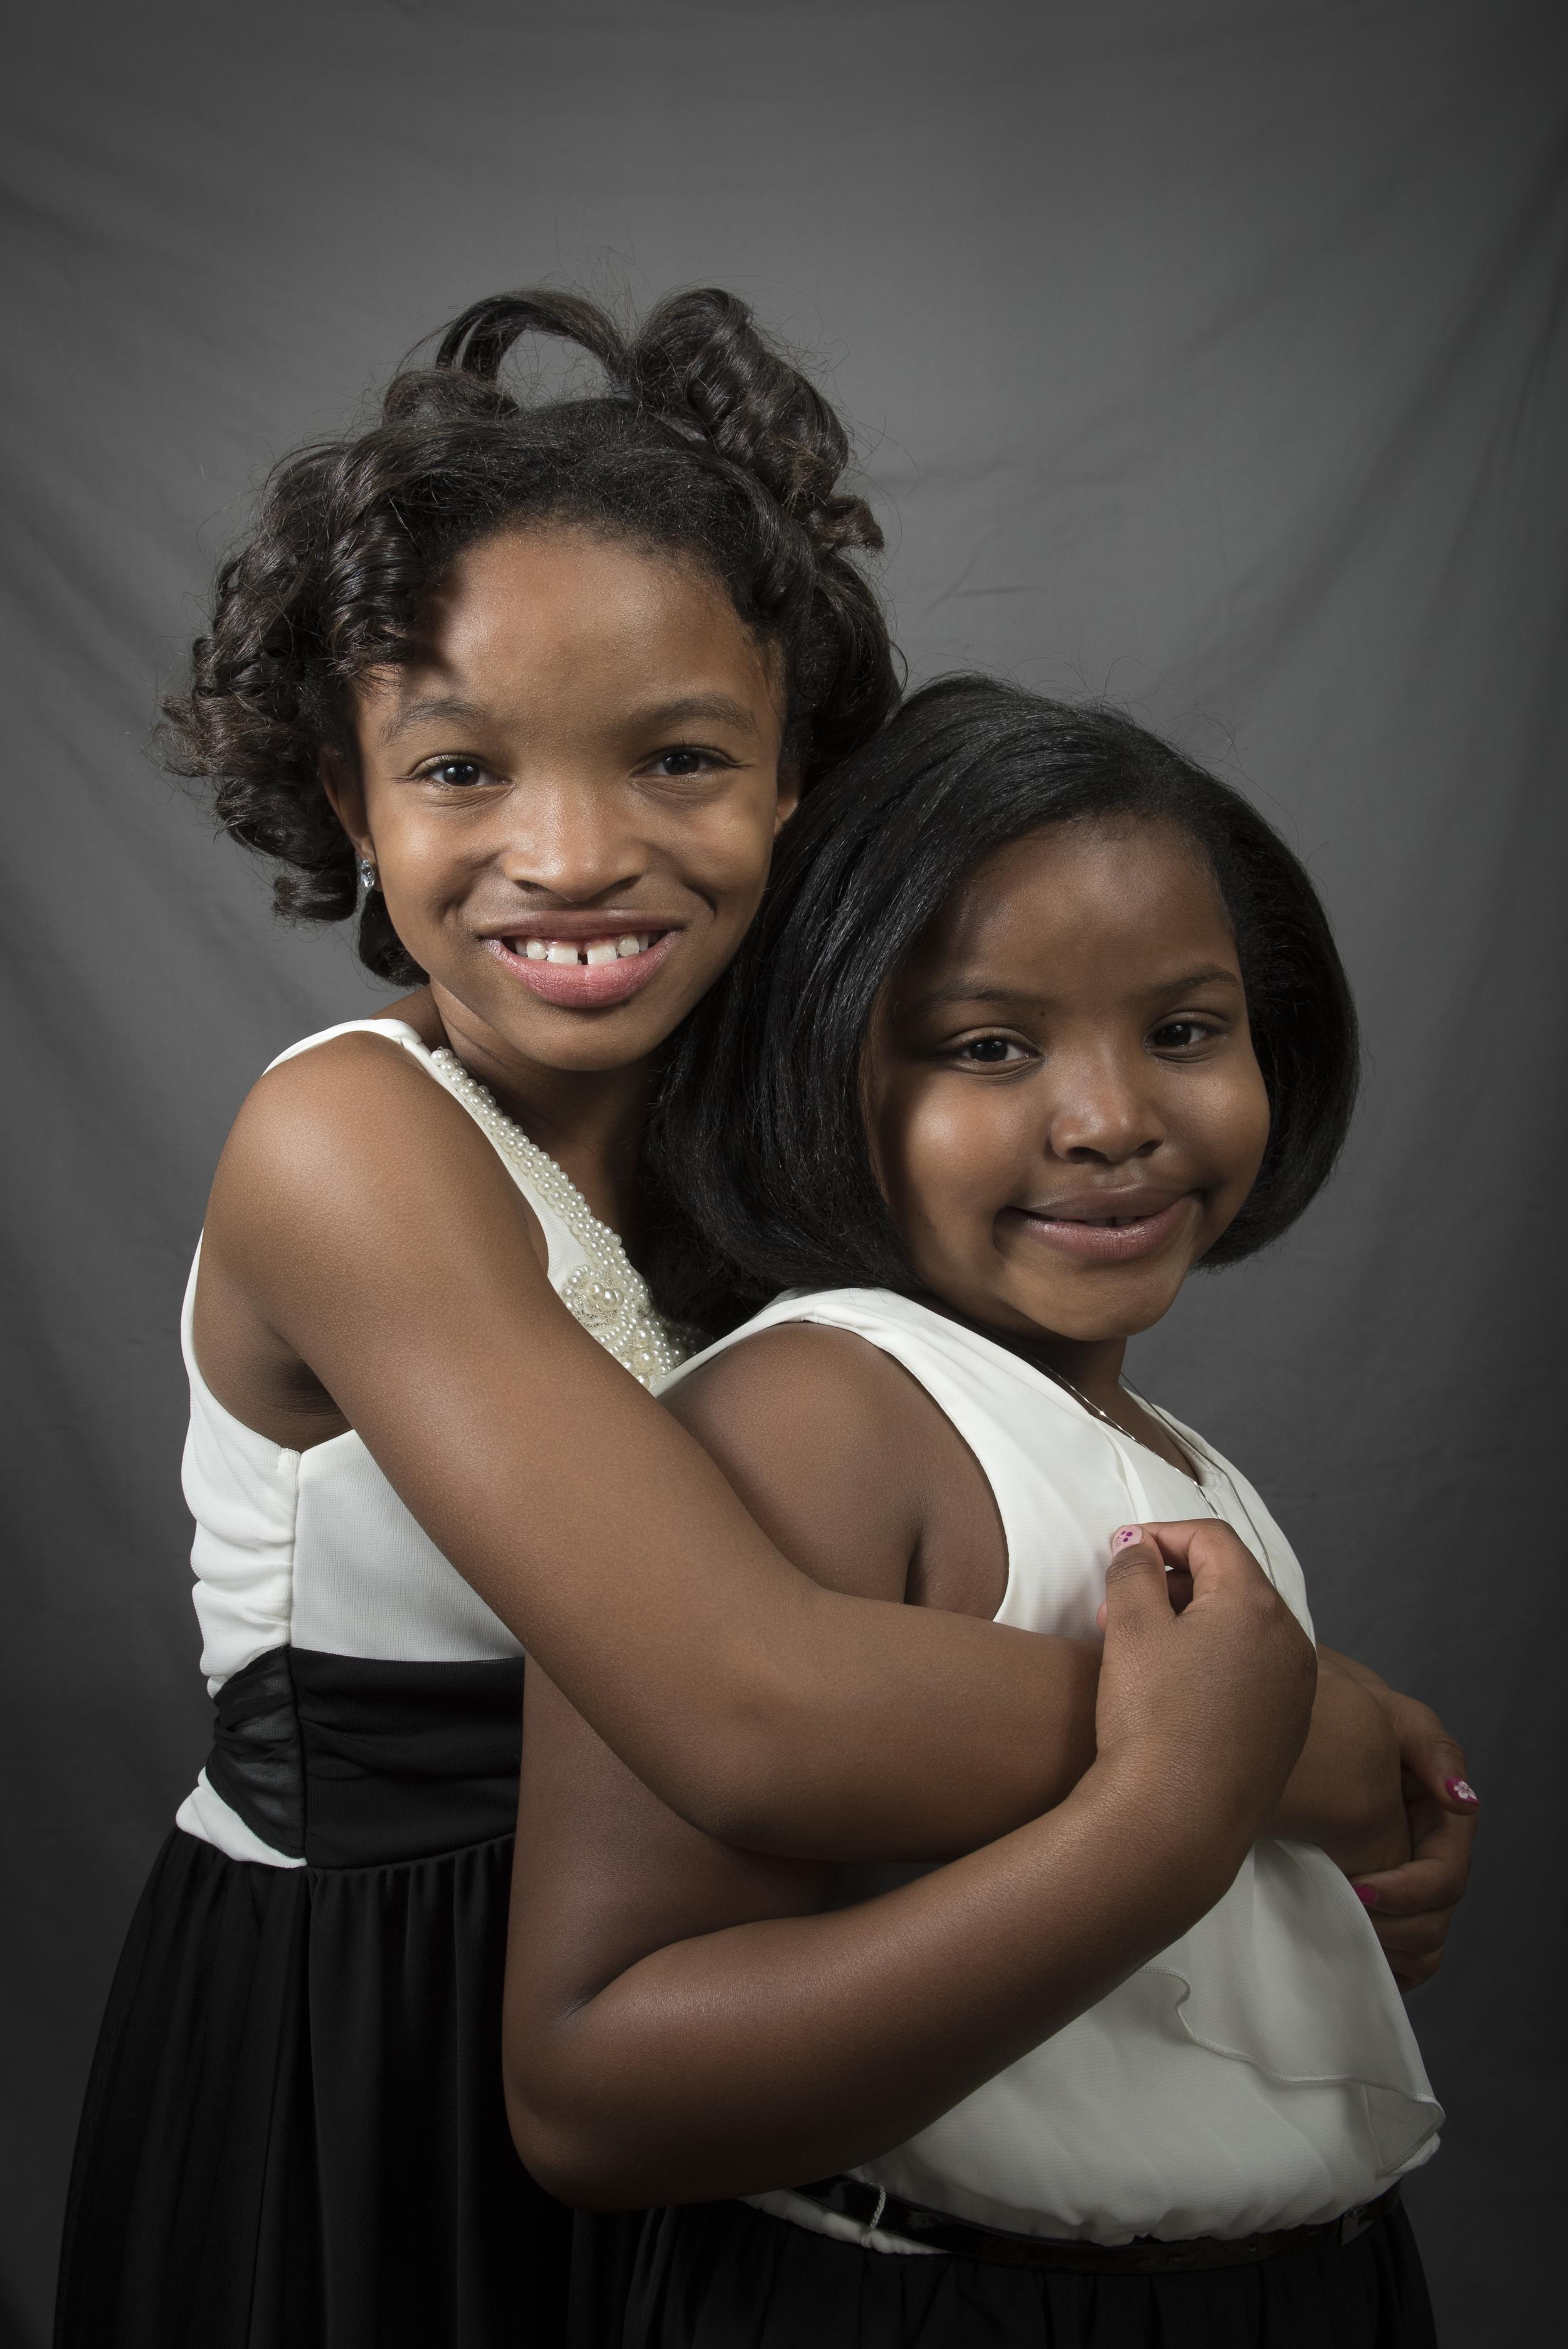 Albuquerque Family Photographer Brundage Family copyright Phillip Banks 2014 (9).jpg